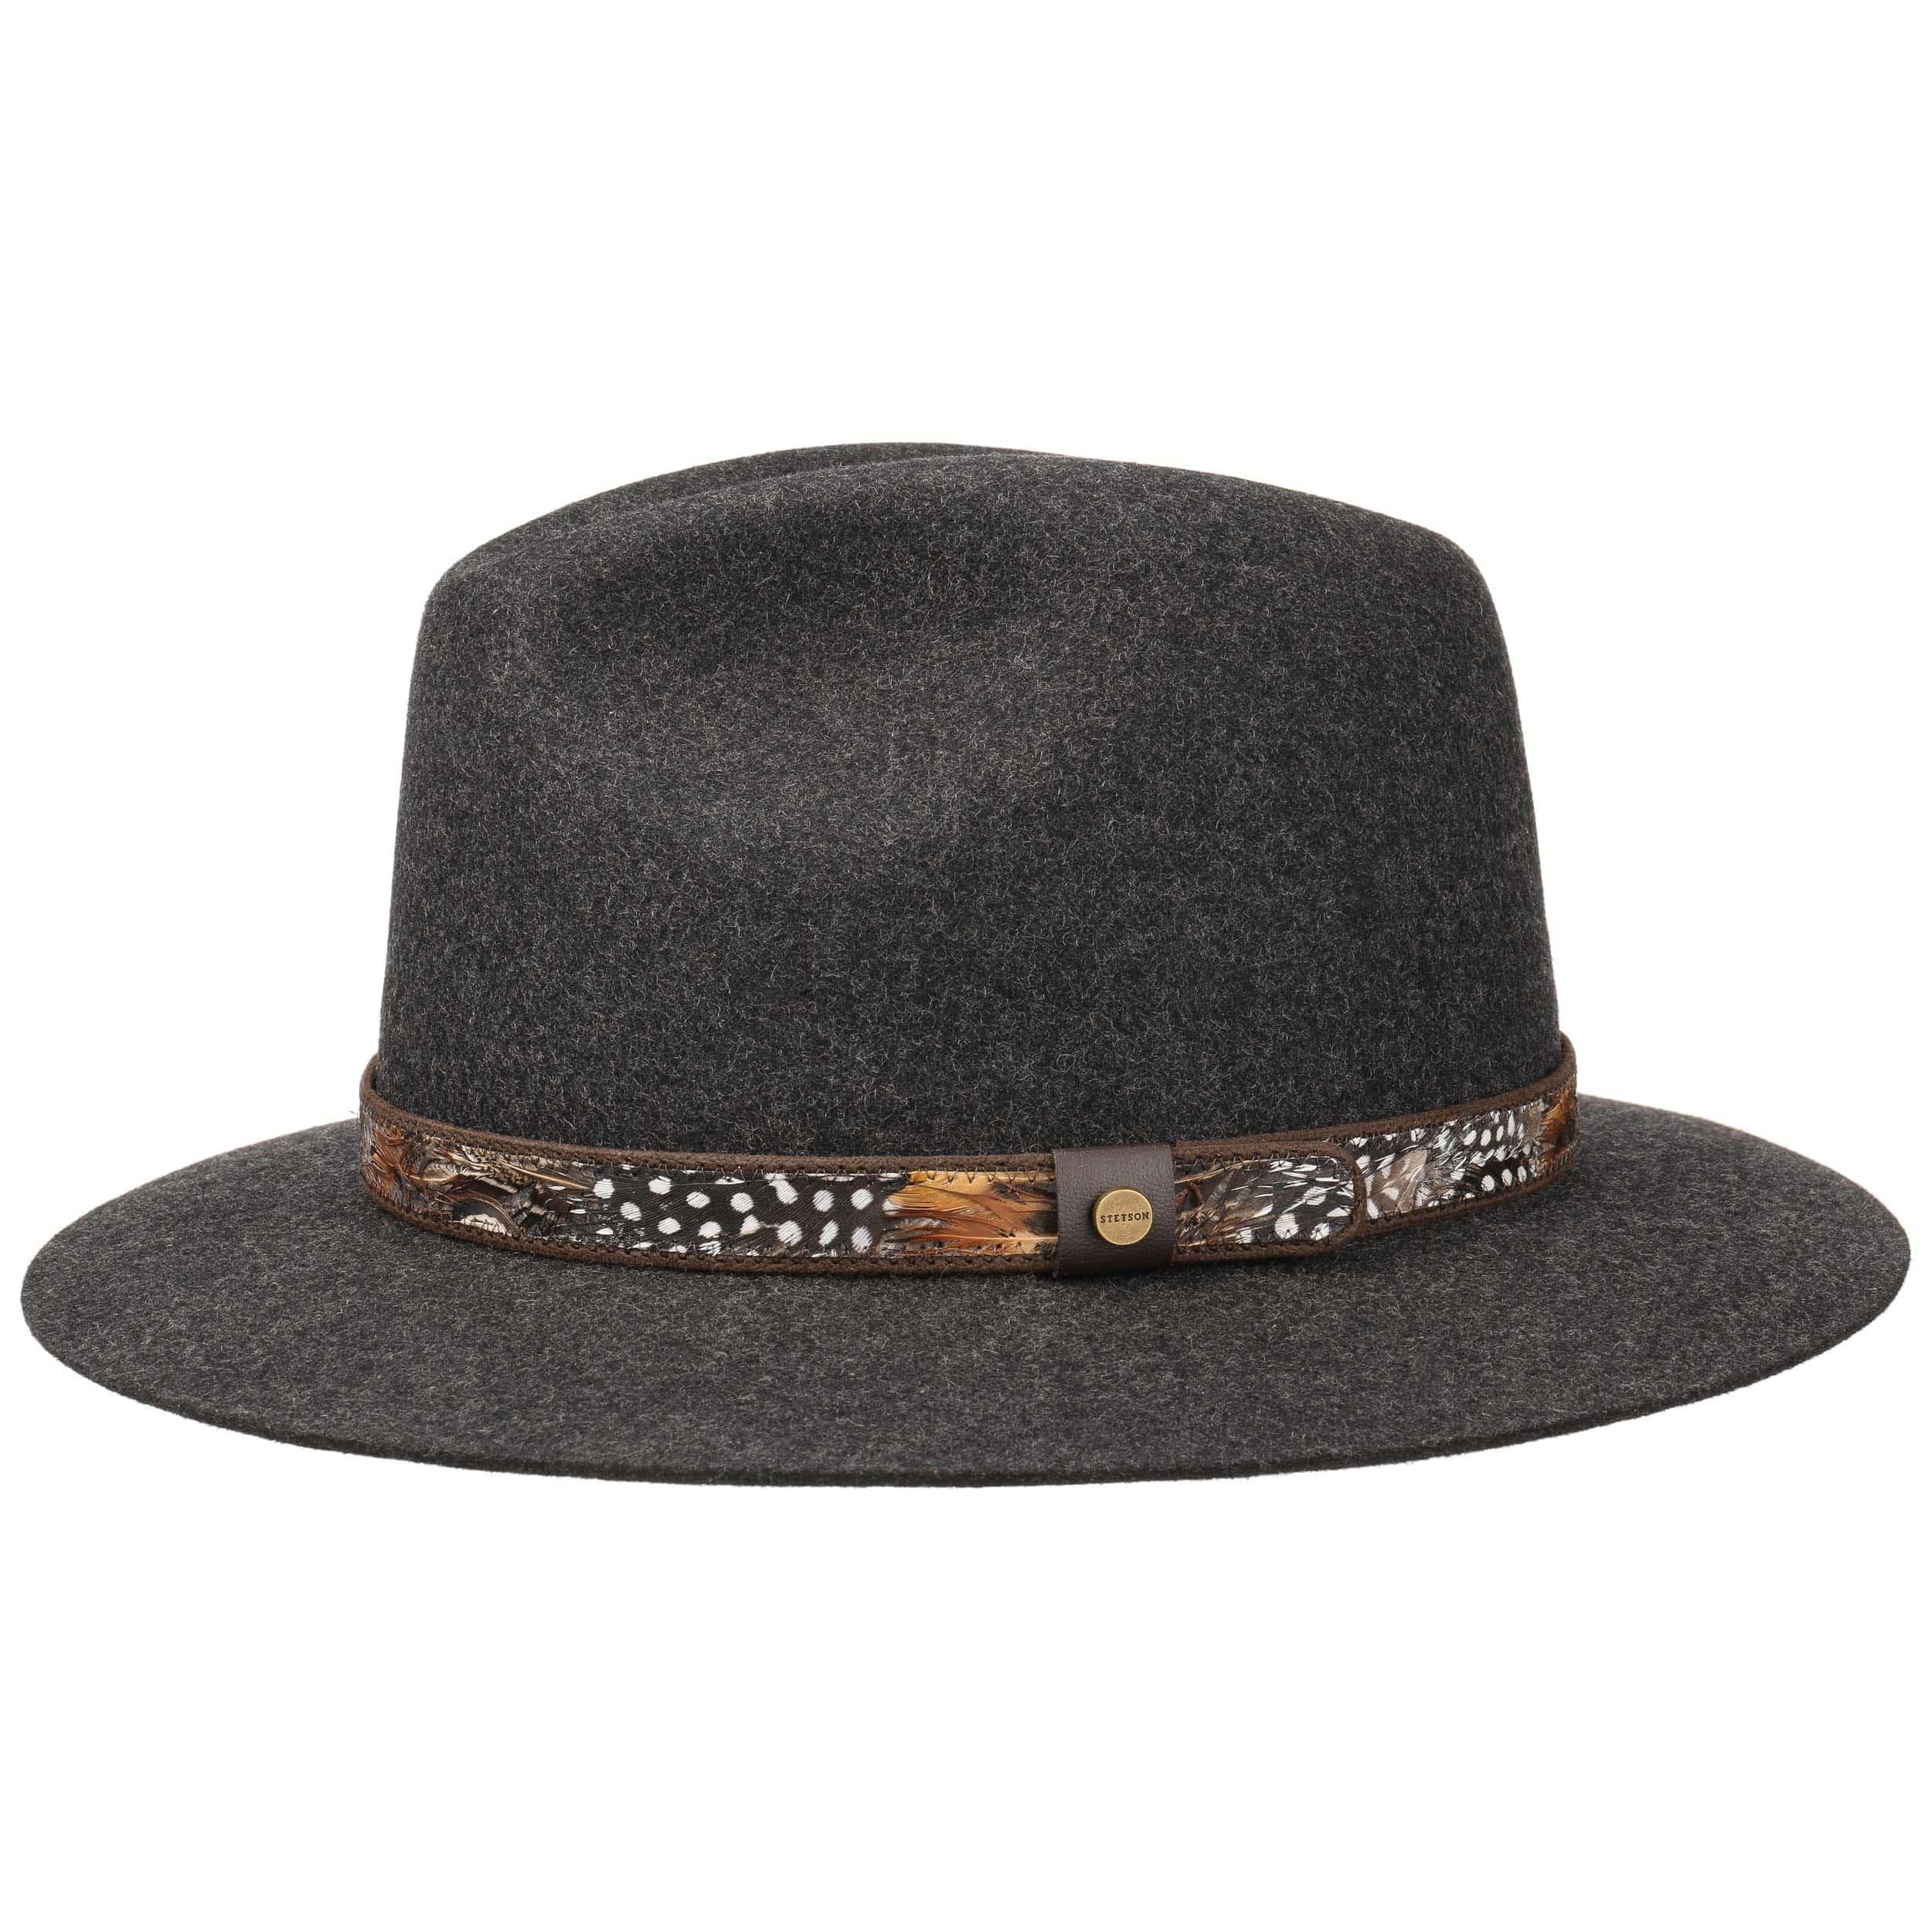 ... Feather Trim Traveller Felt Hat by Stetson - anthracite-mottled 1 ... 3ef89c648f7